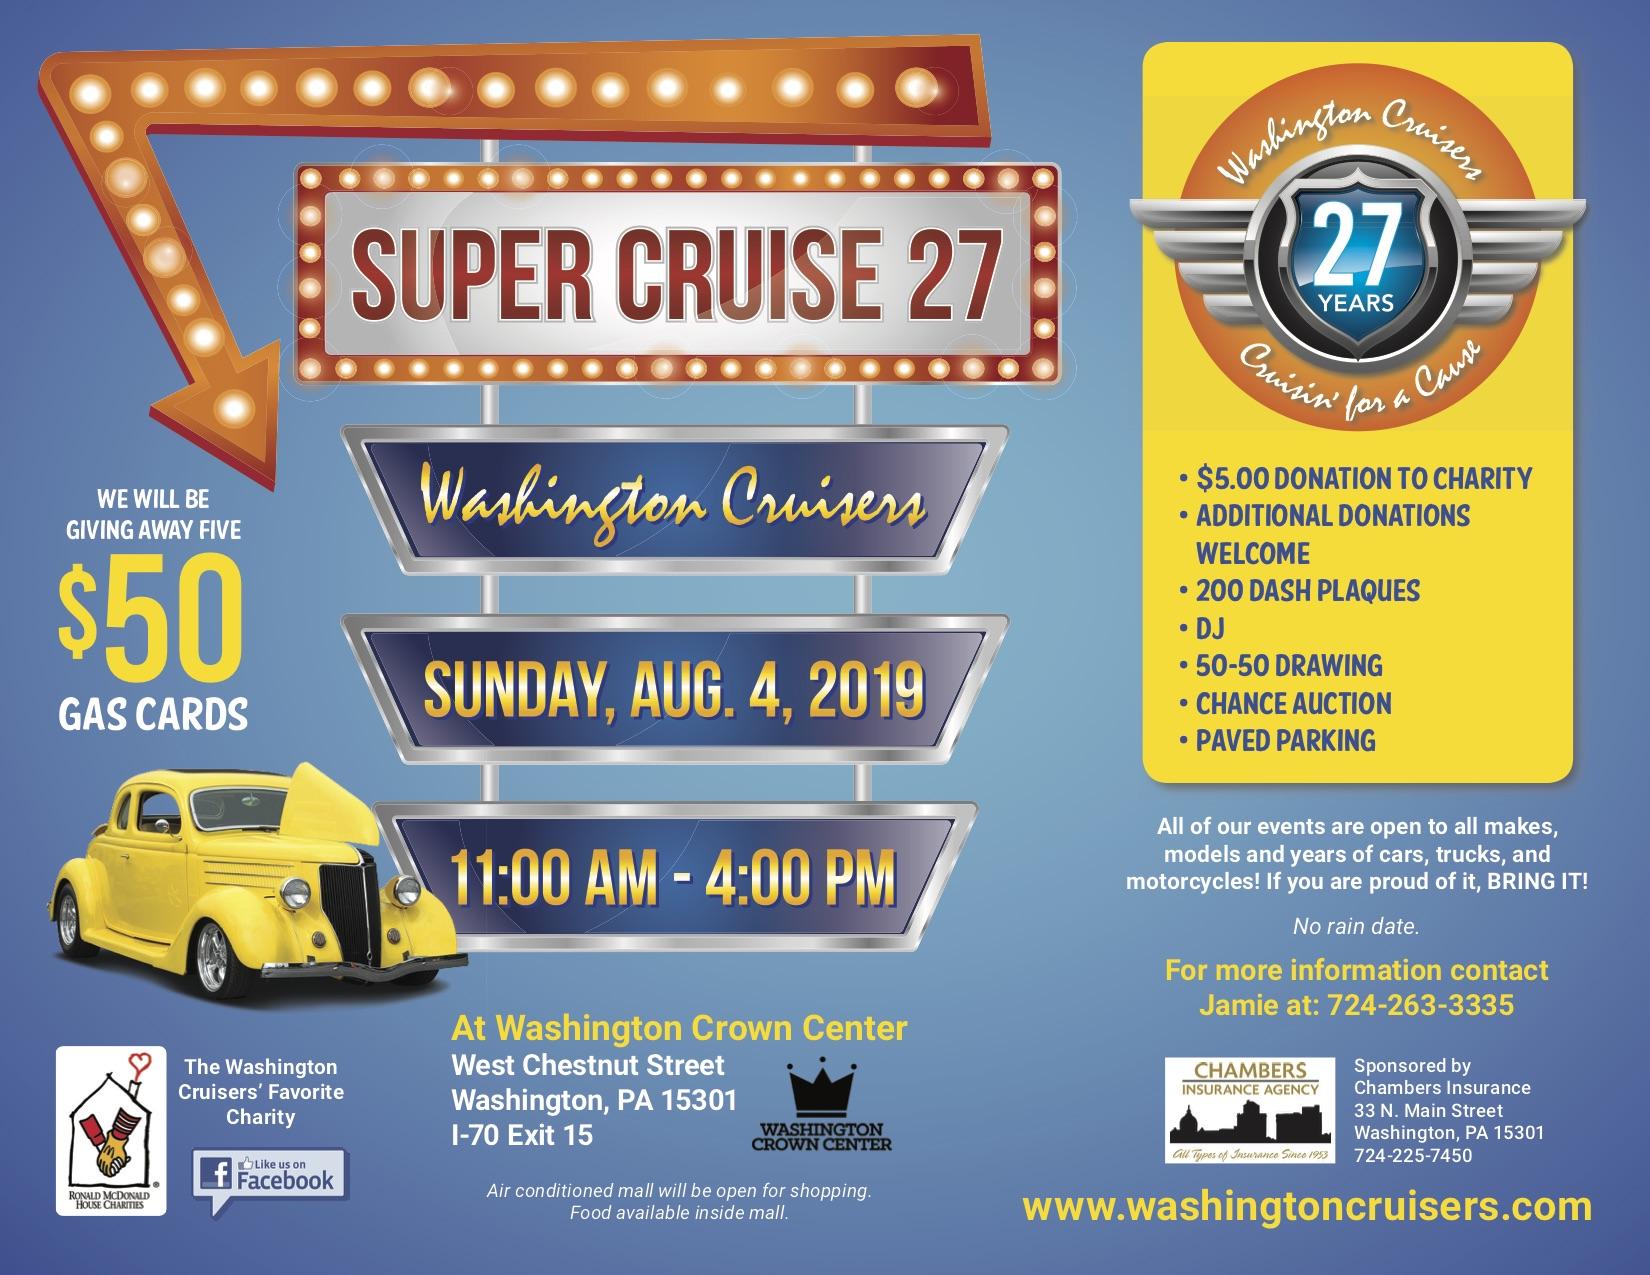 Washington County Cruisers even information